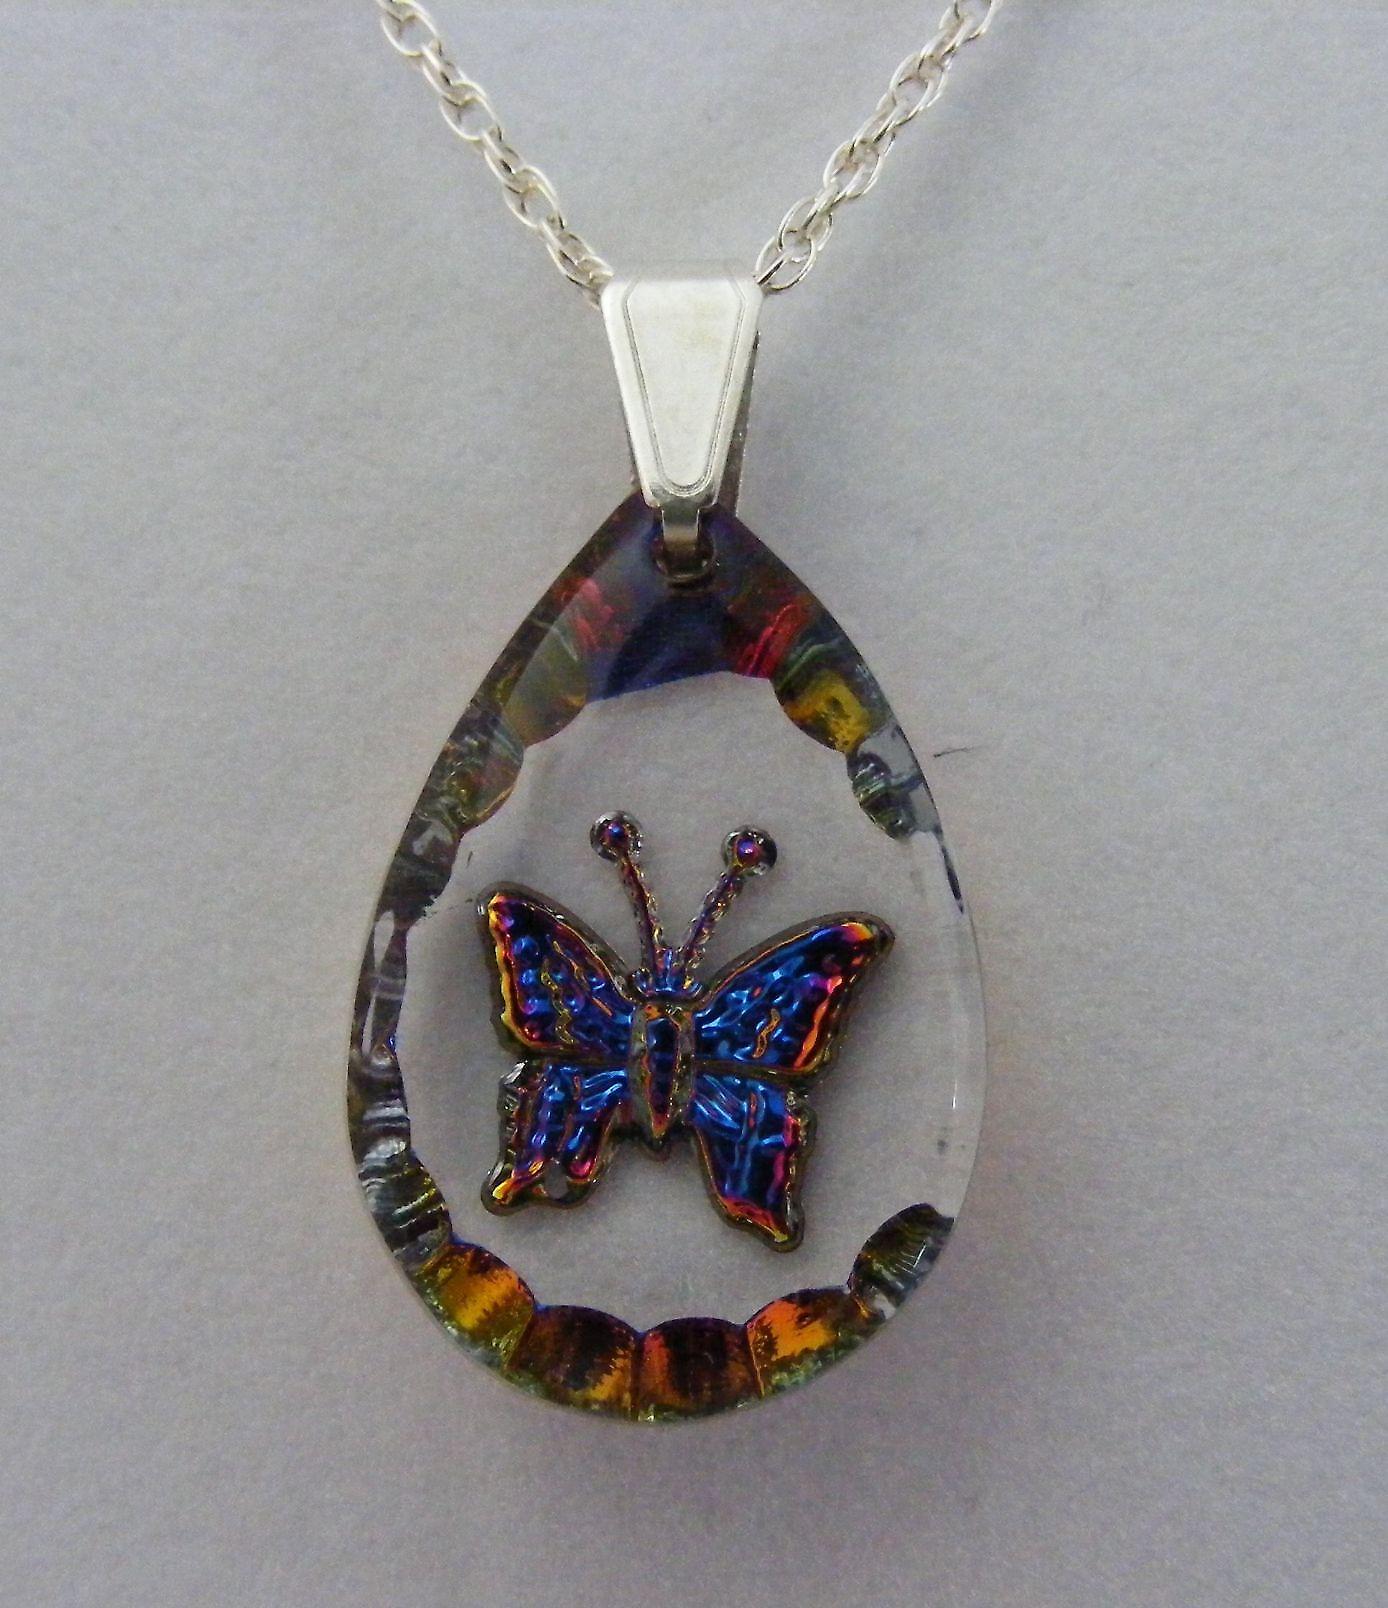 Heliotropo lágrima mariposa colgante de cristal